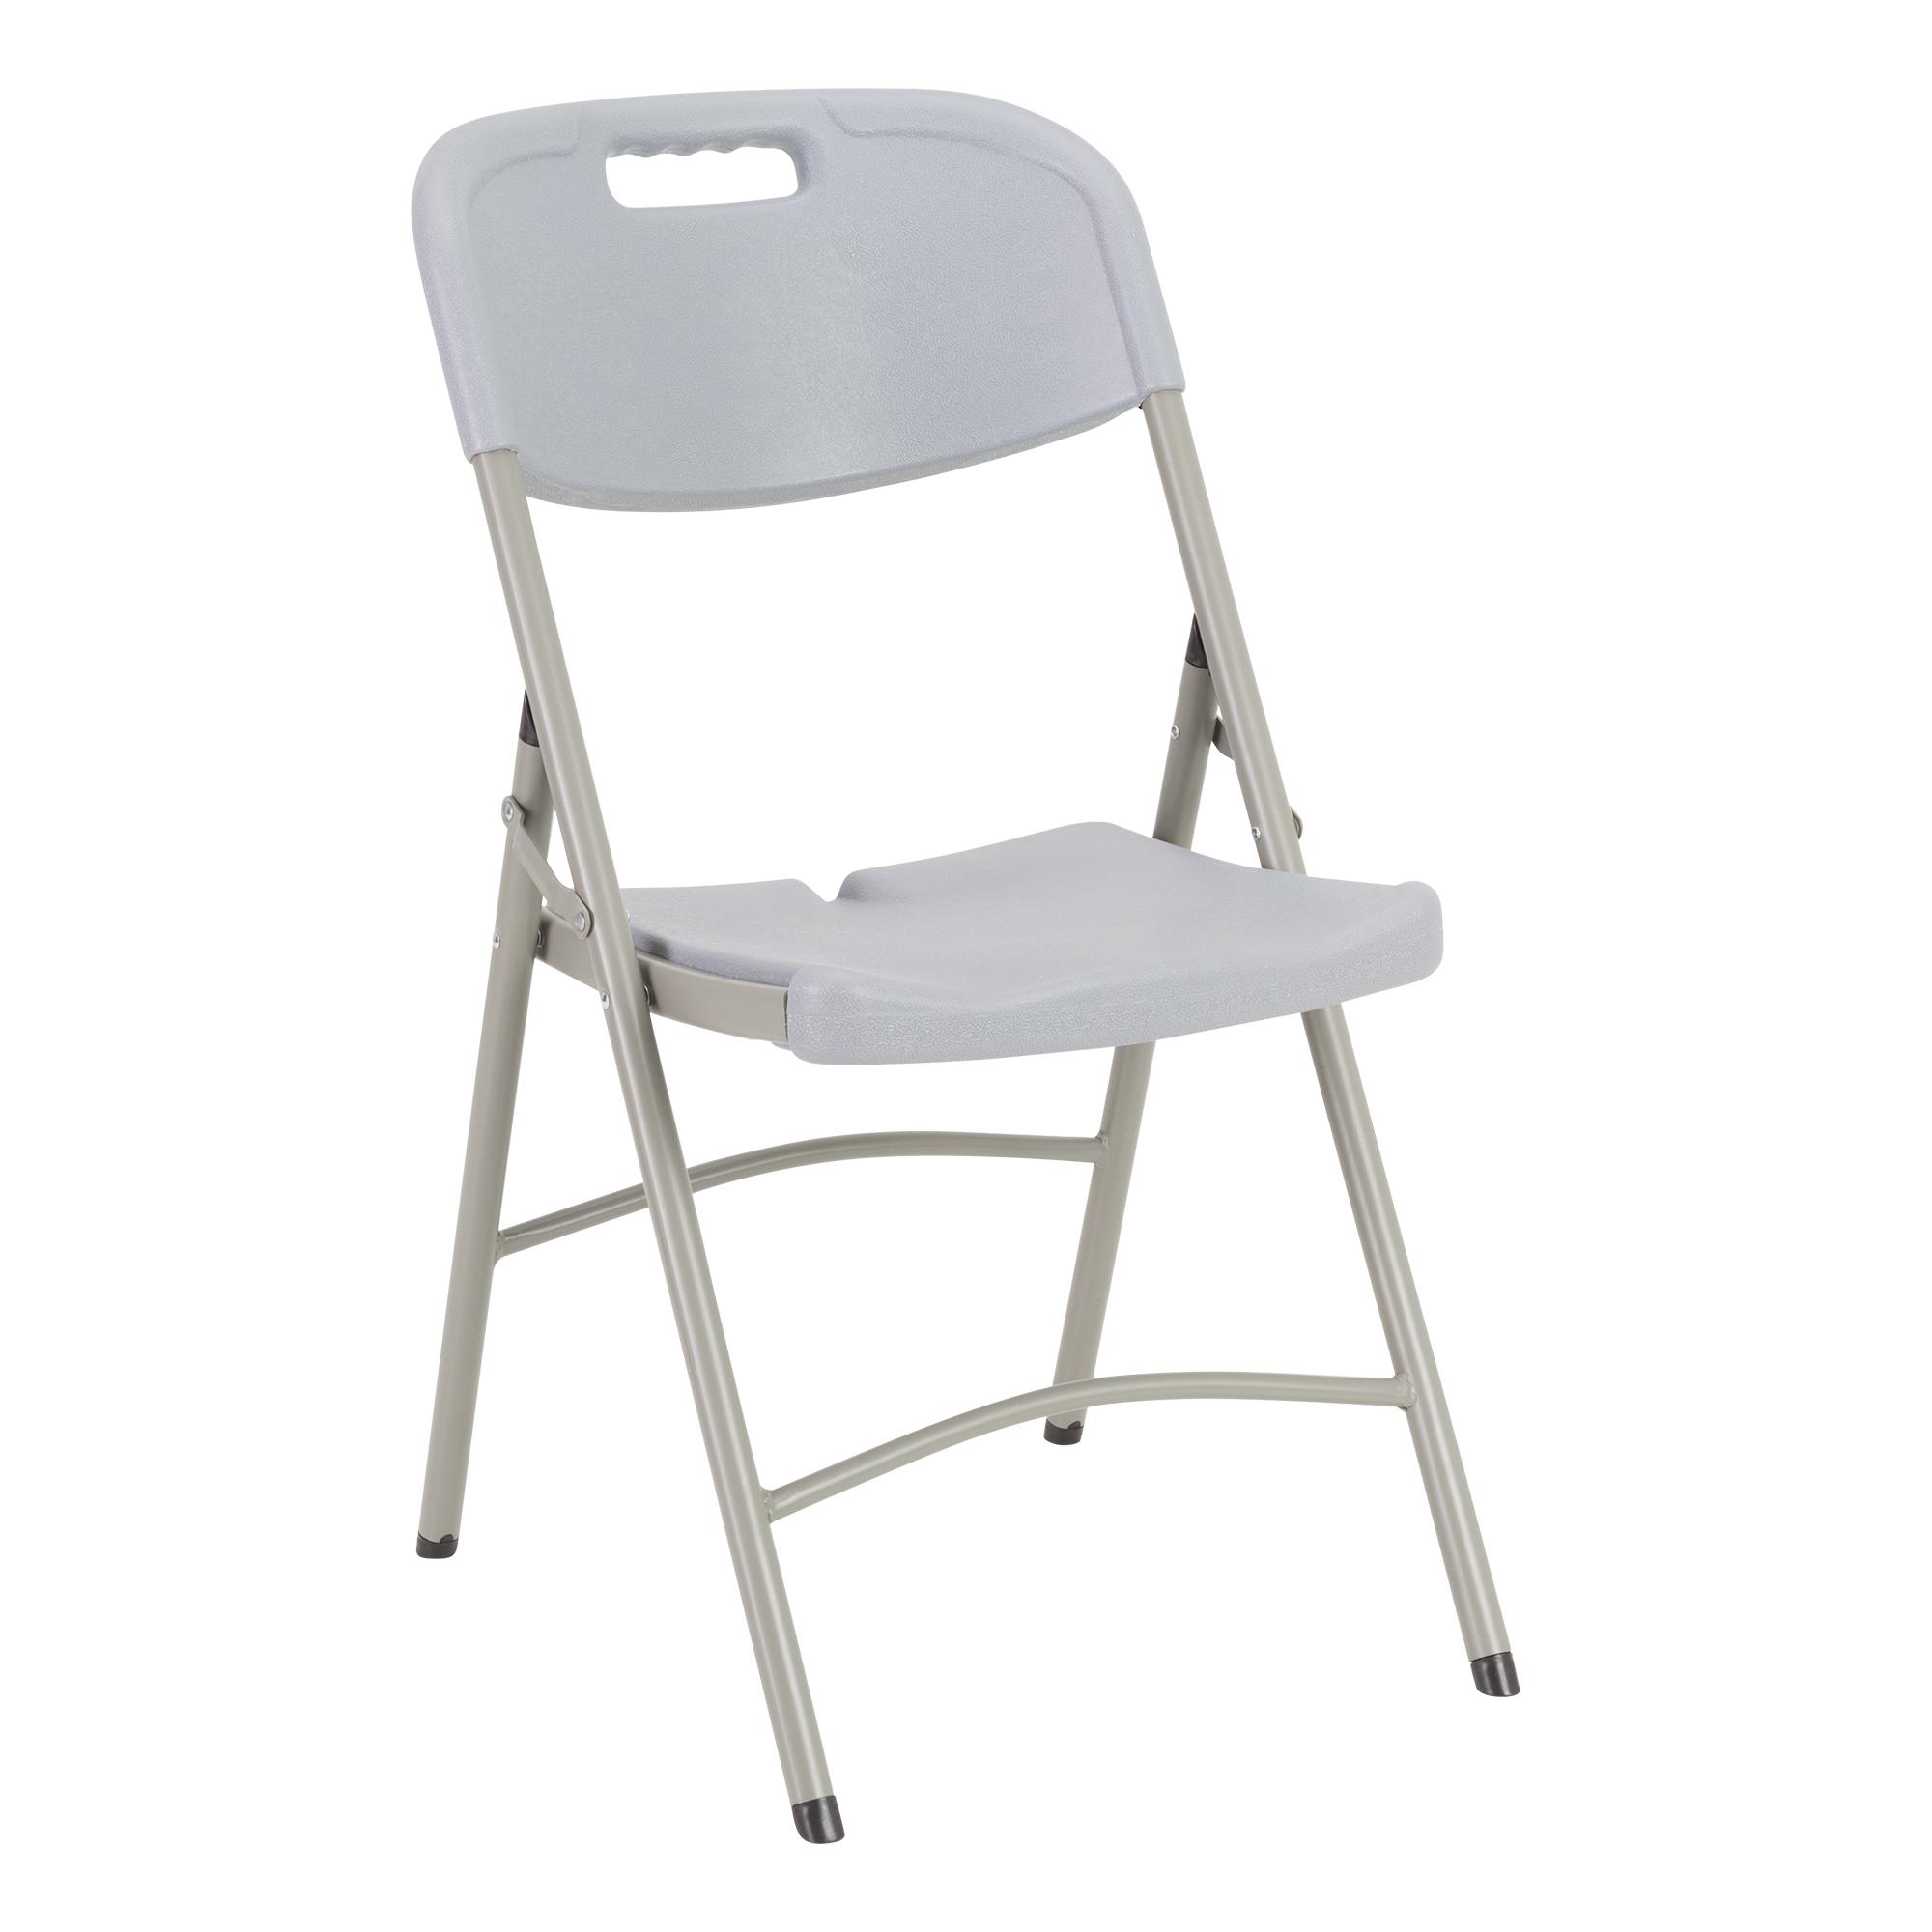 Merveilleux Heavy Duty Indoor/Outdoor Blow Molded Folding Chair   Gray